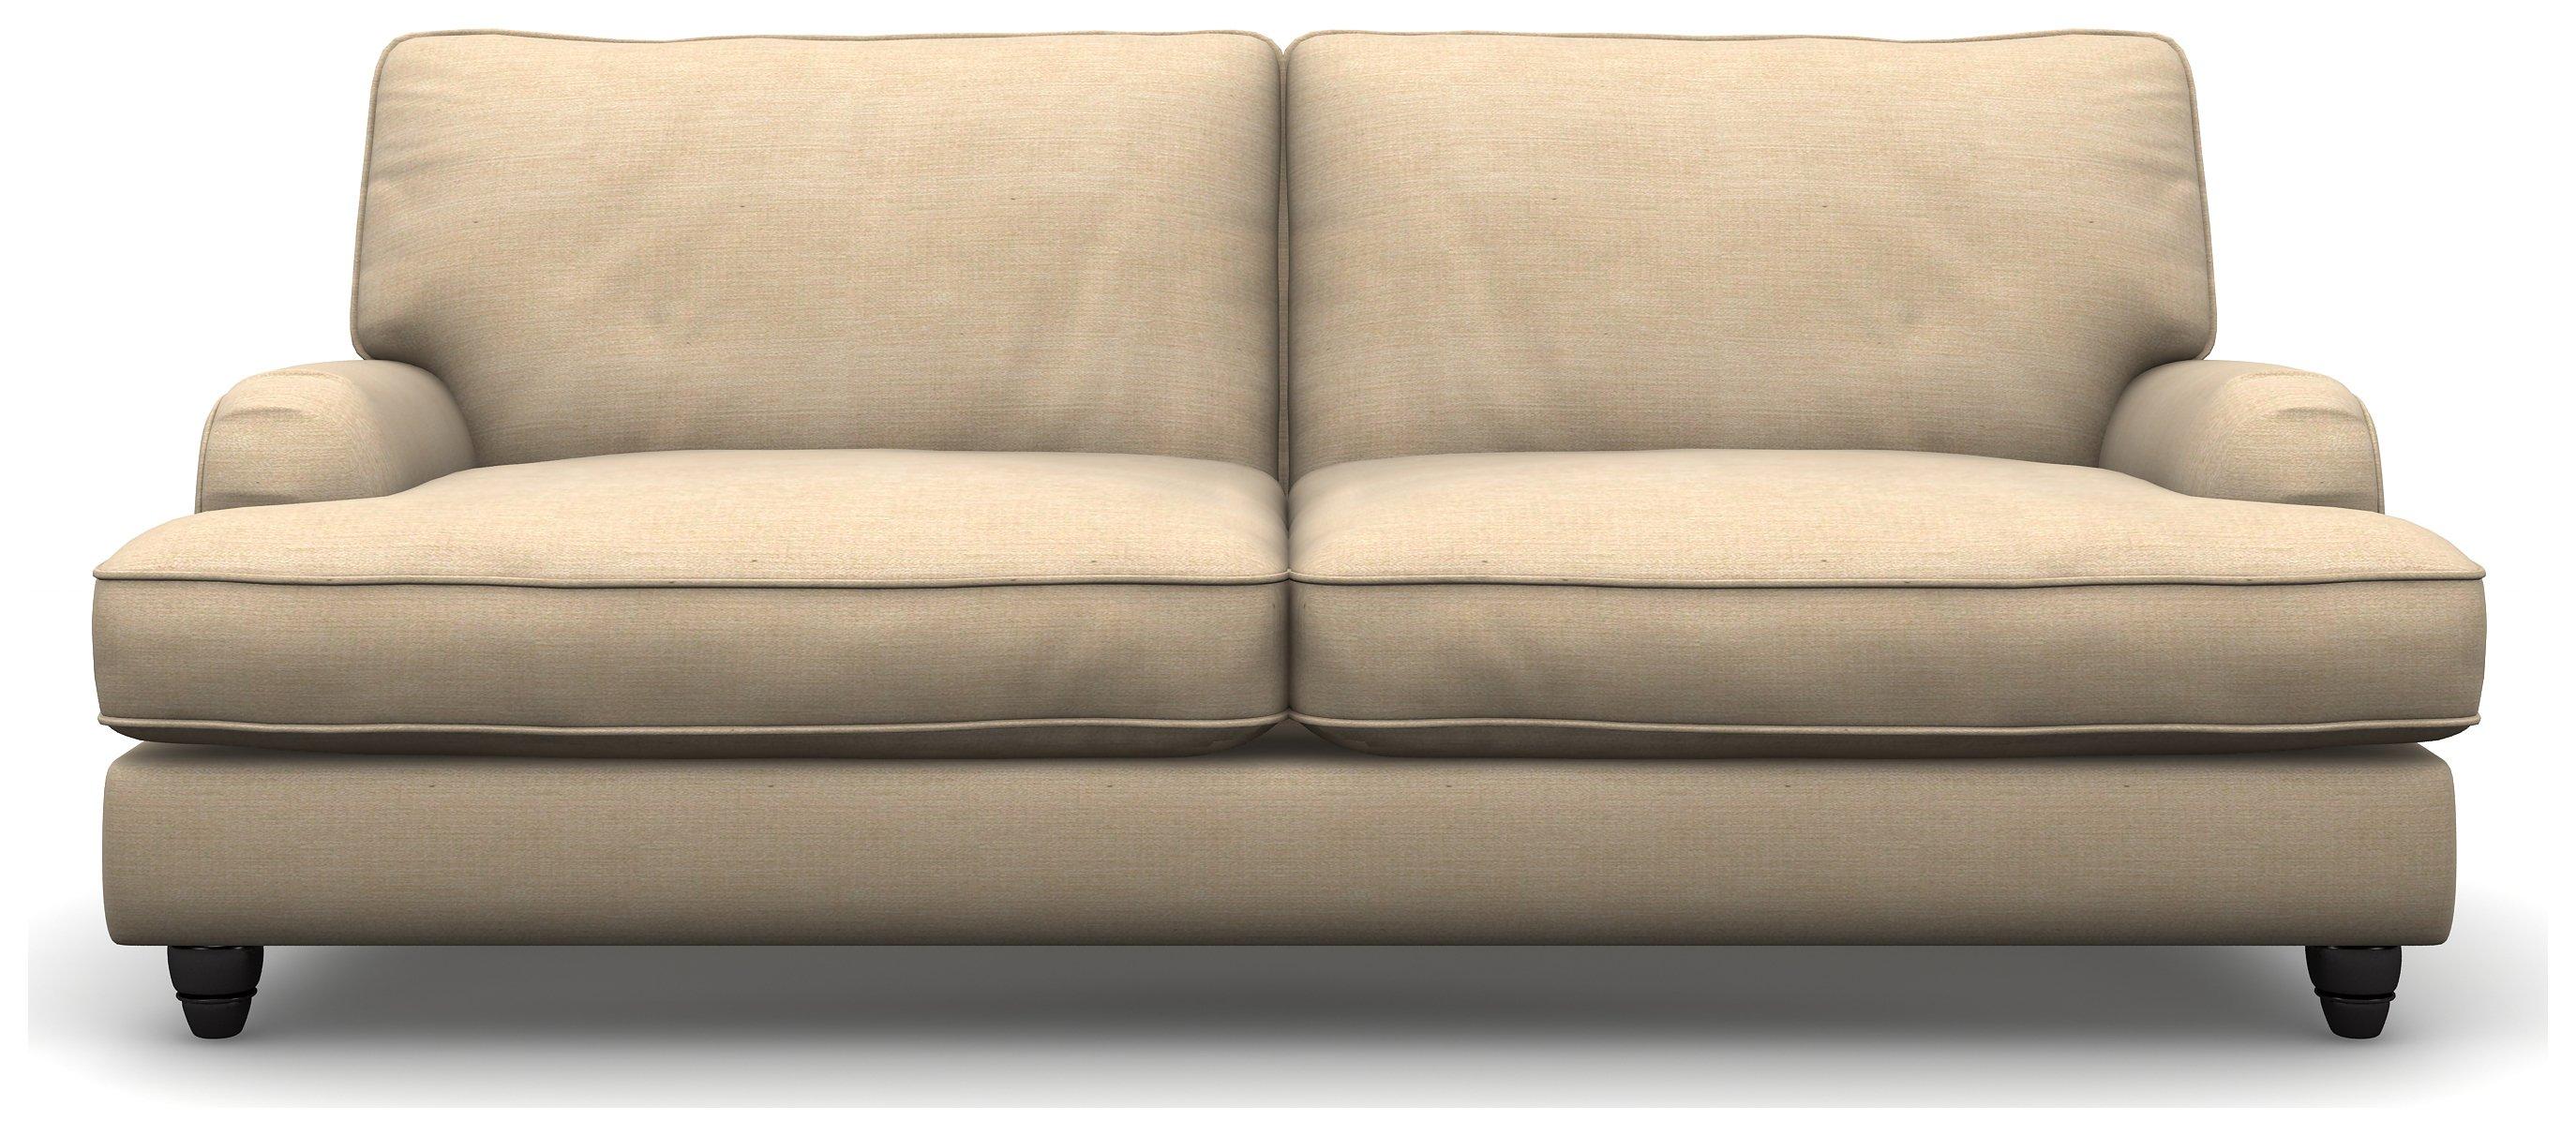 Heart of House Adeline Stylish 3 Seater Fabric Sofa - Beige.